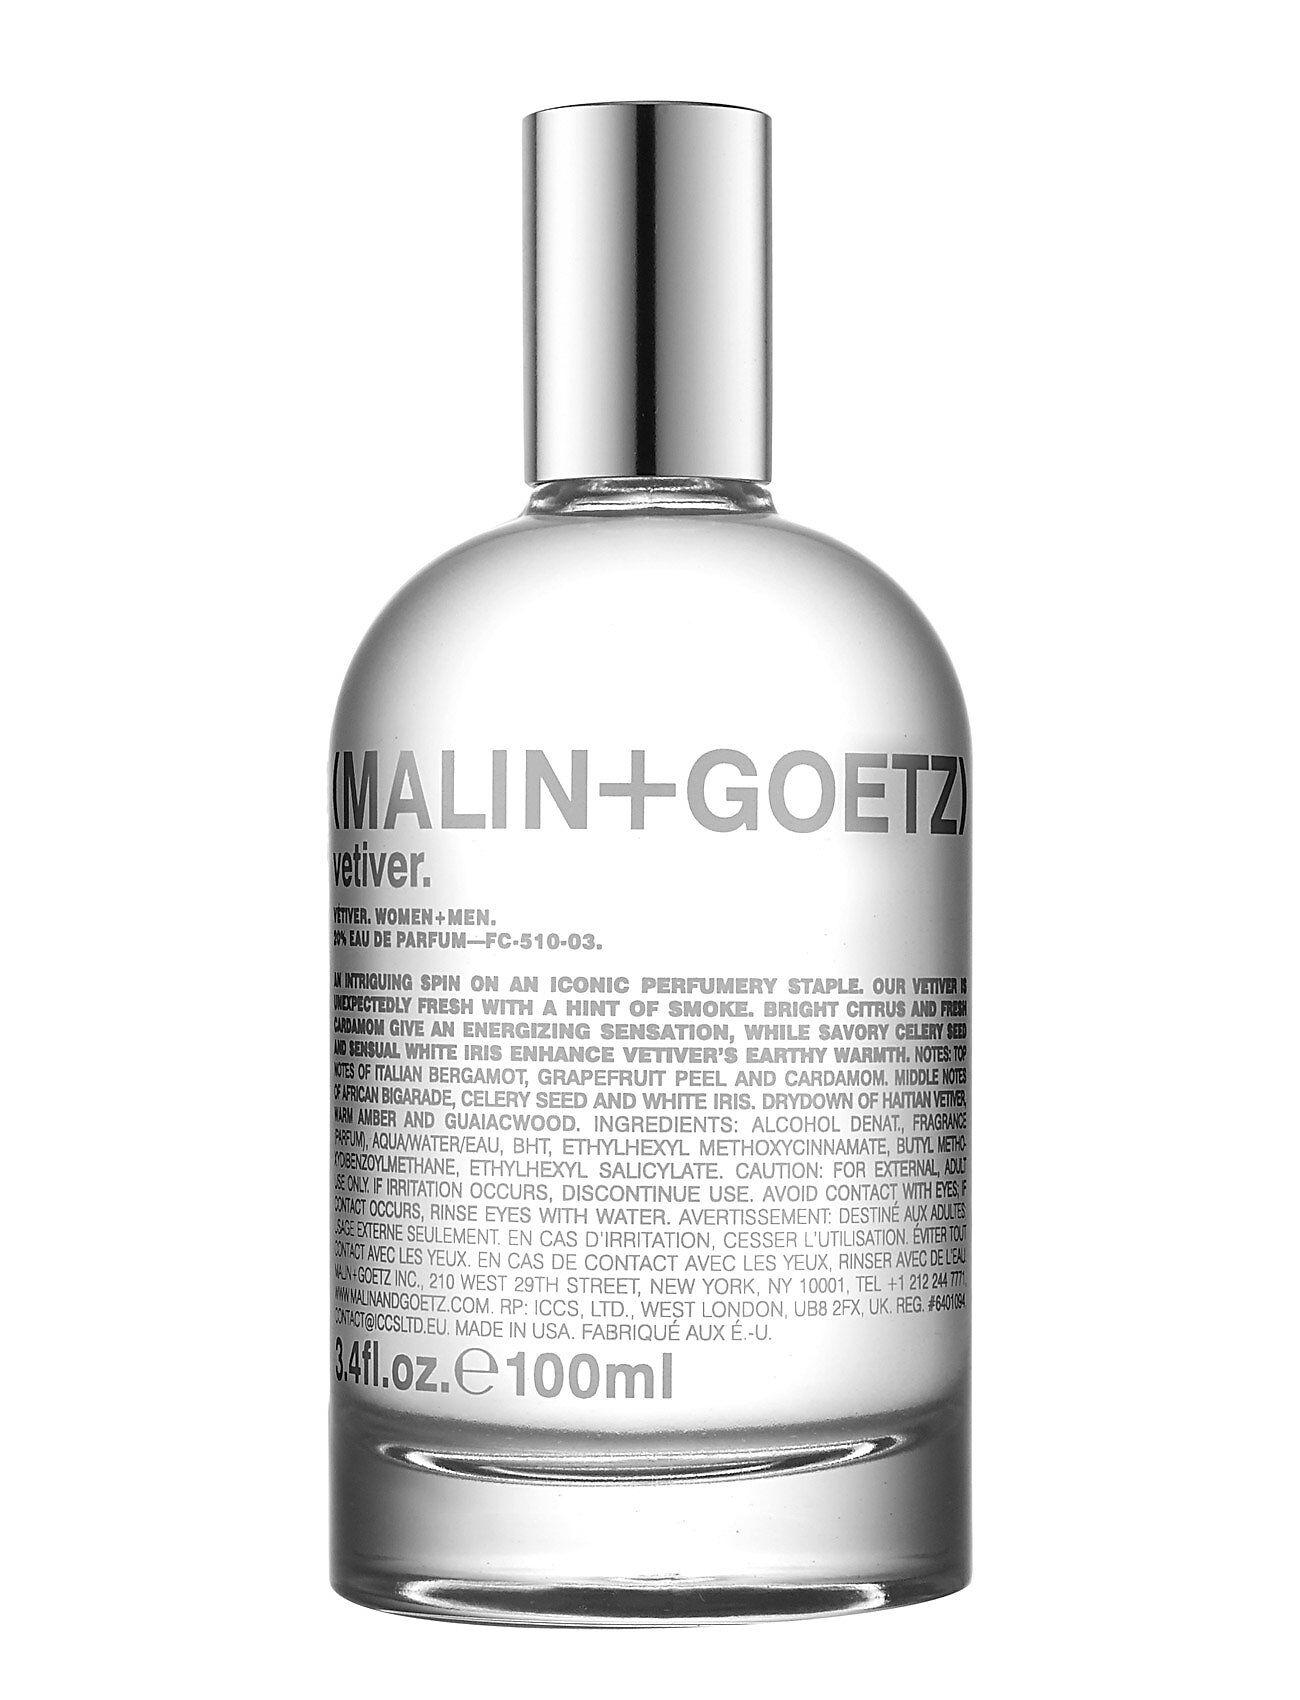 Malin+Goetz Vetiver Eau De Parfume